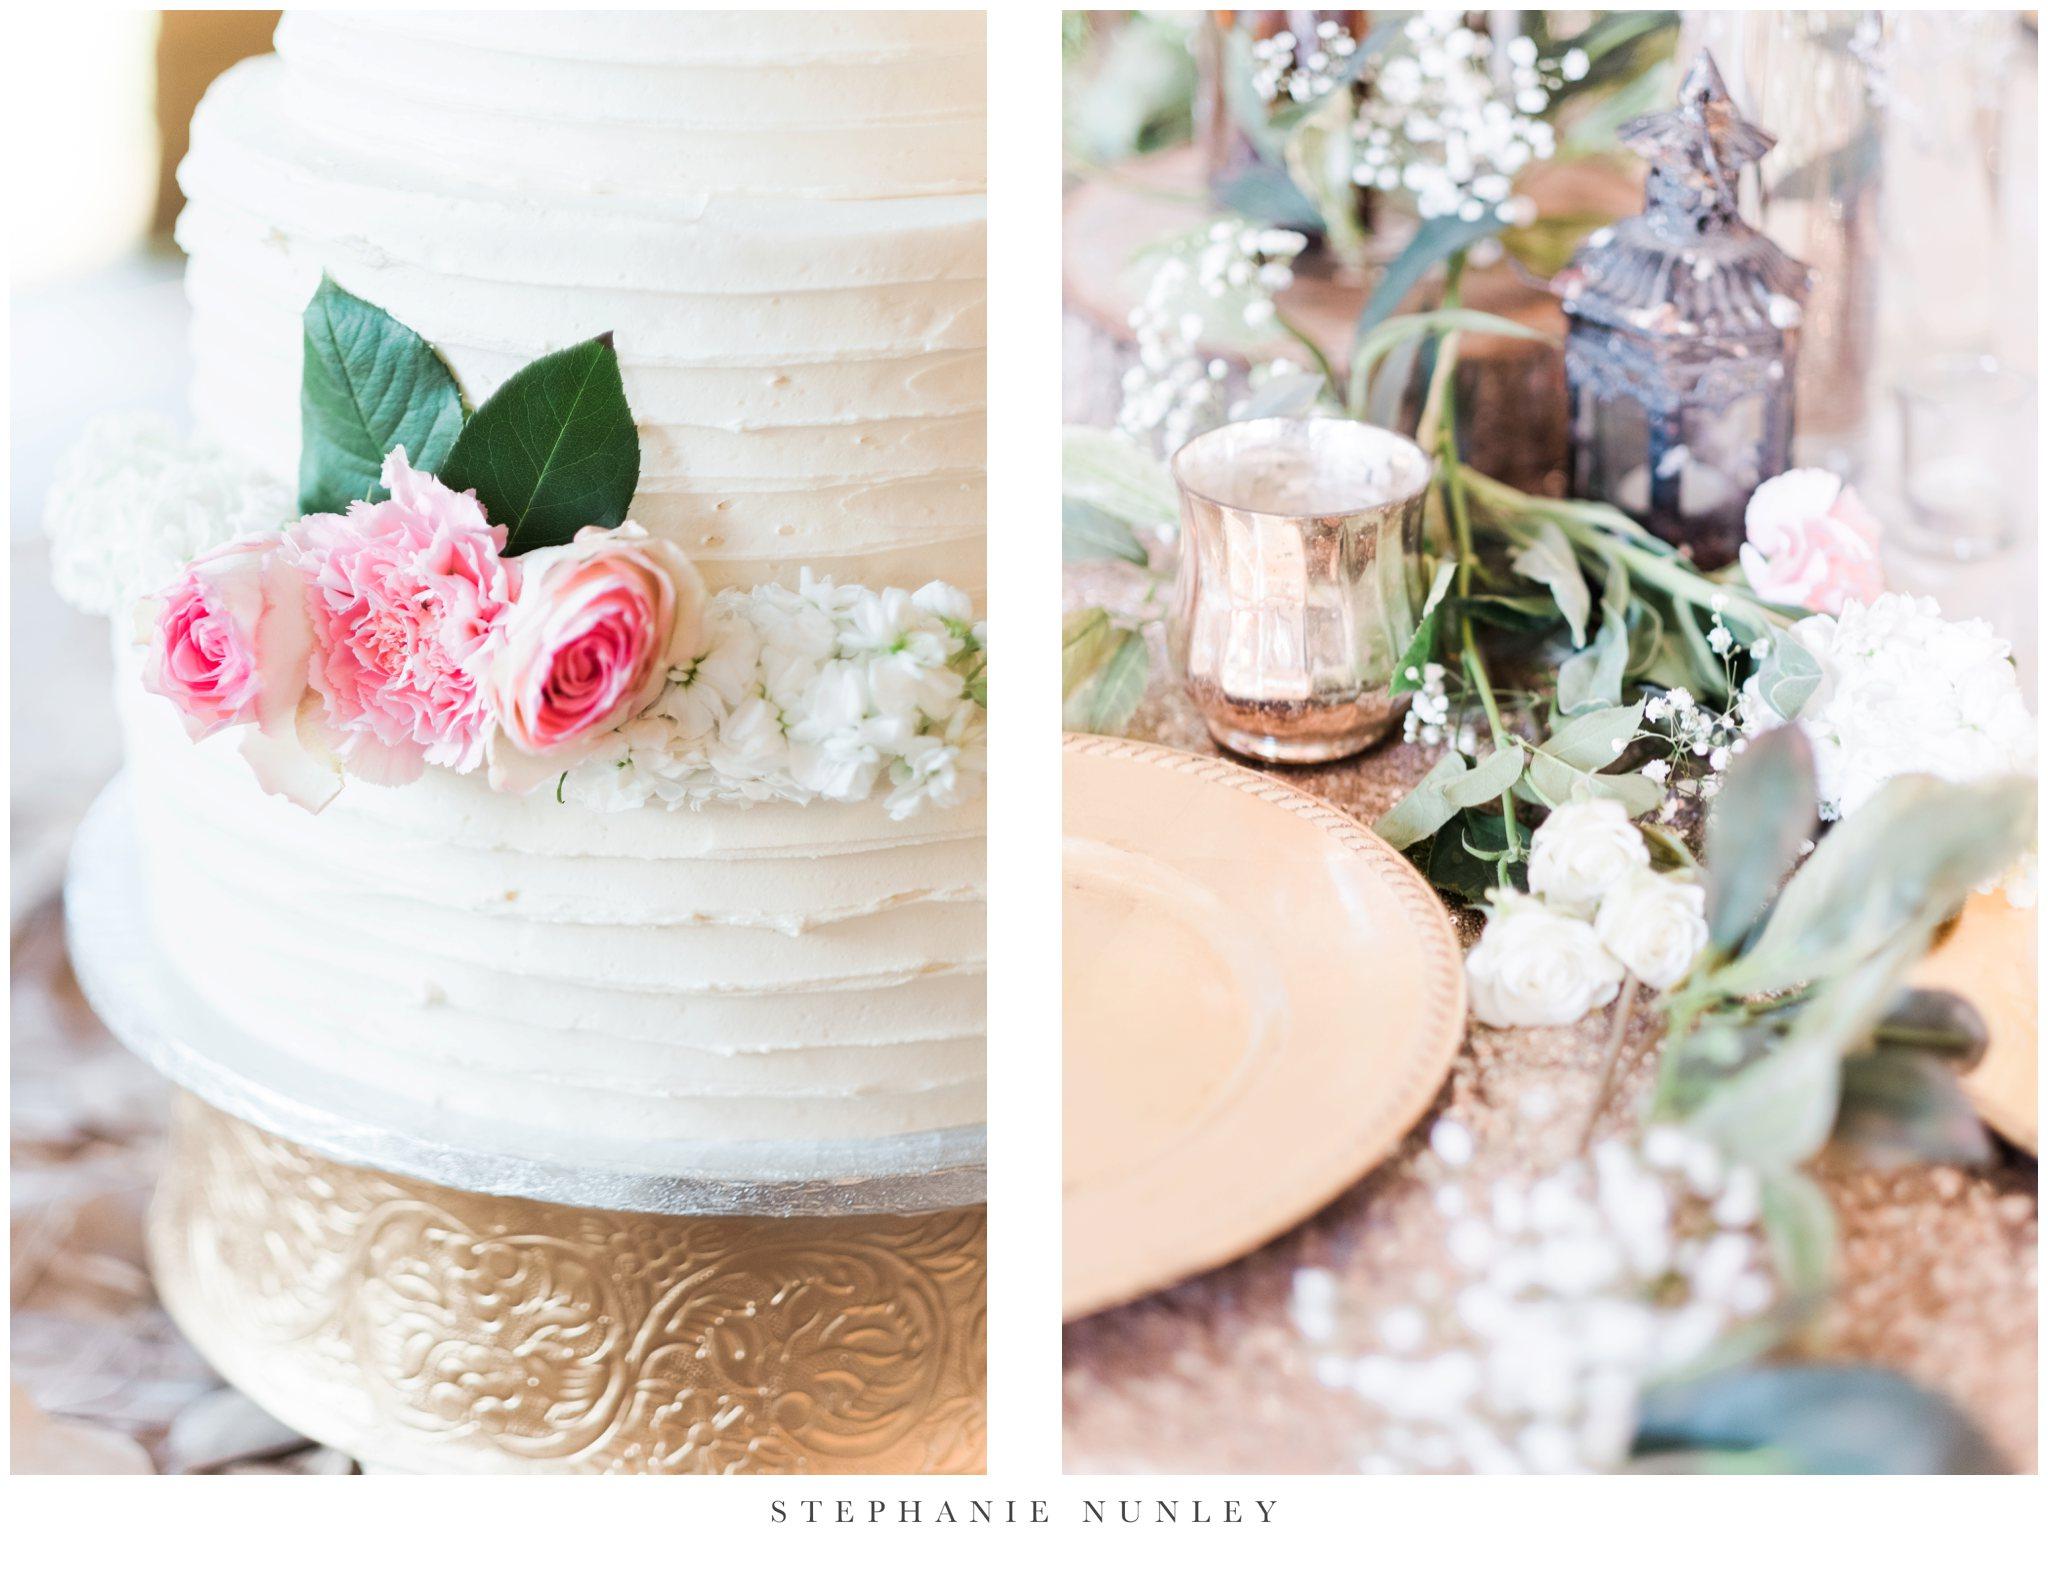 romantic-outdoor-wedding-with-flower-crown-0123.jpg